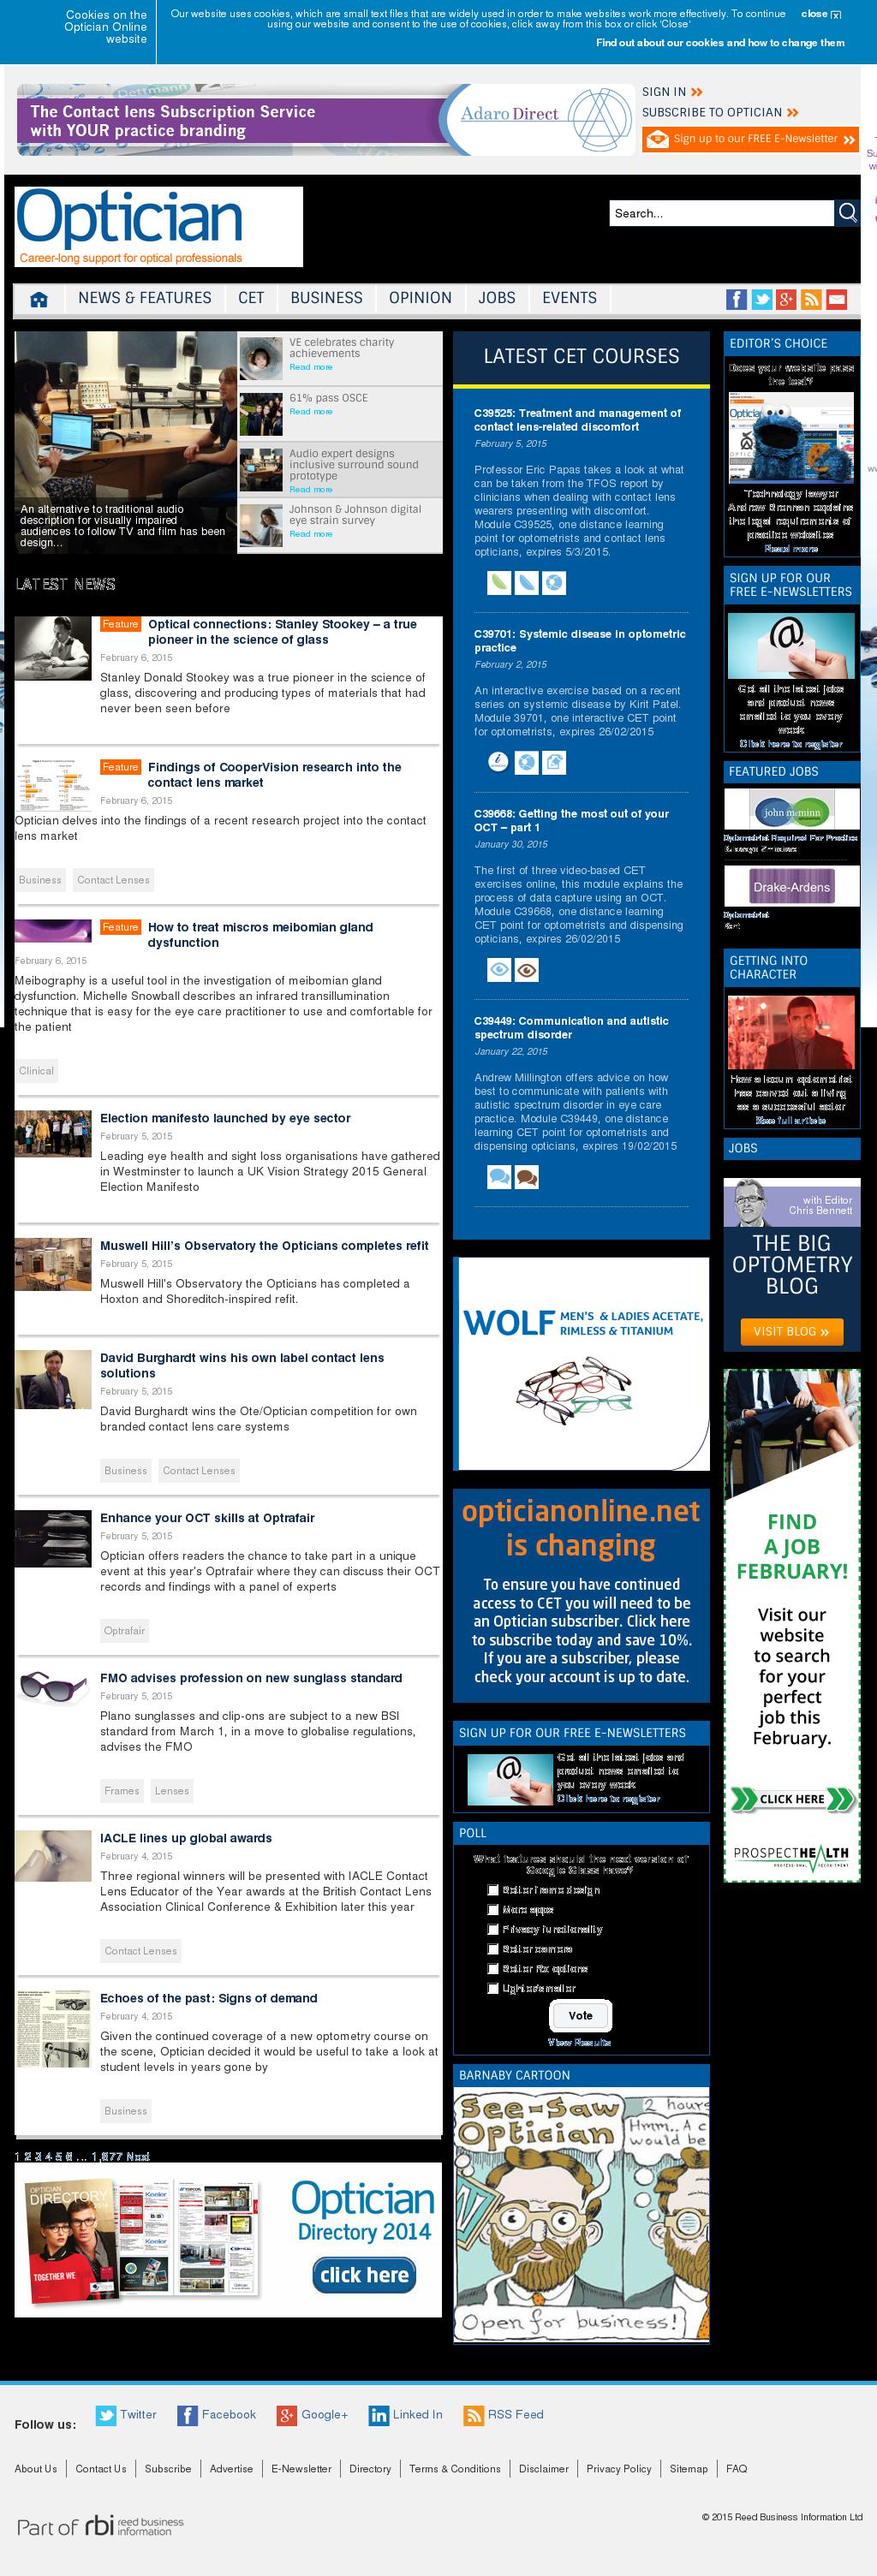 Optician Competitors, Revenue and Employees - Owler Company Profile